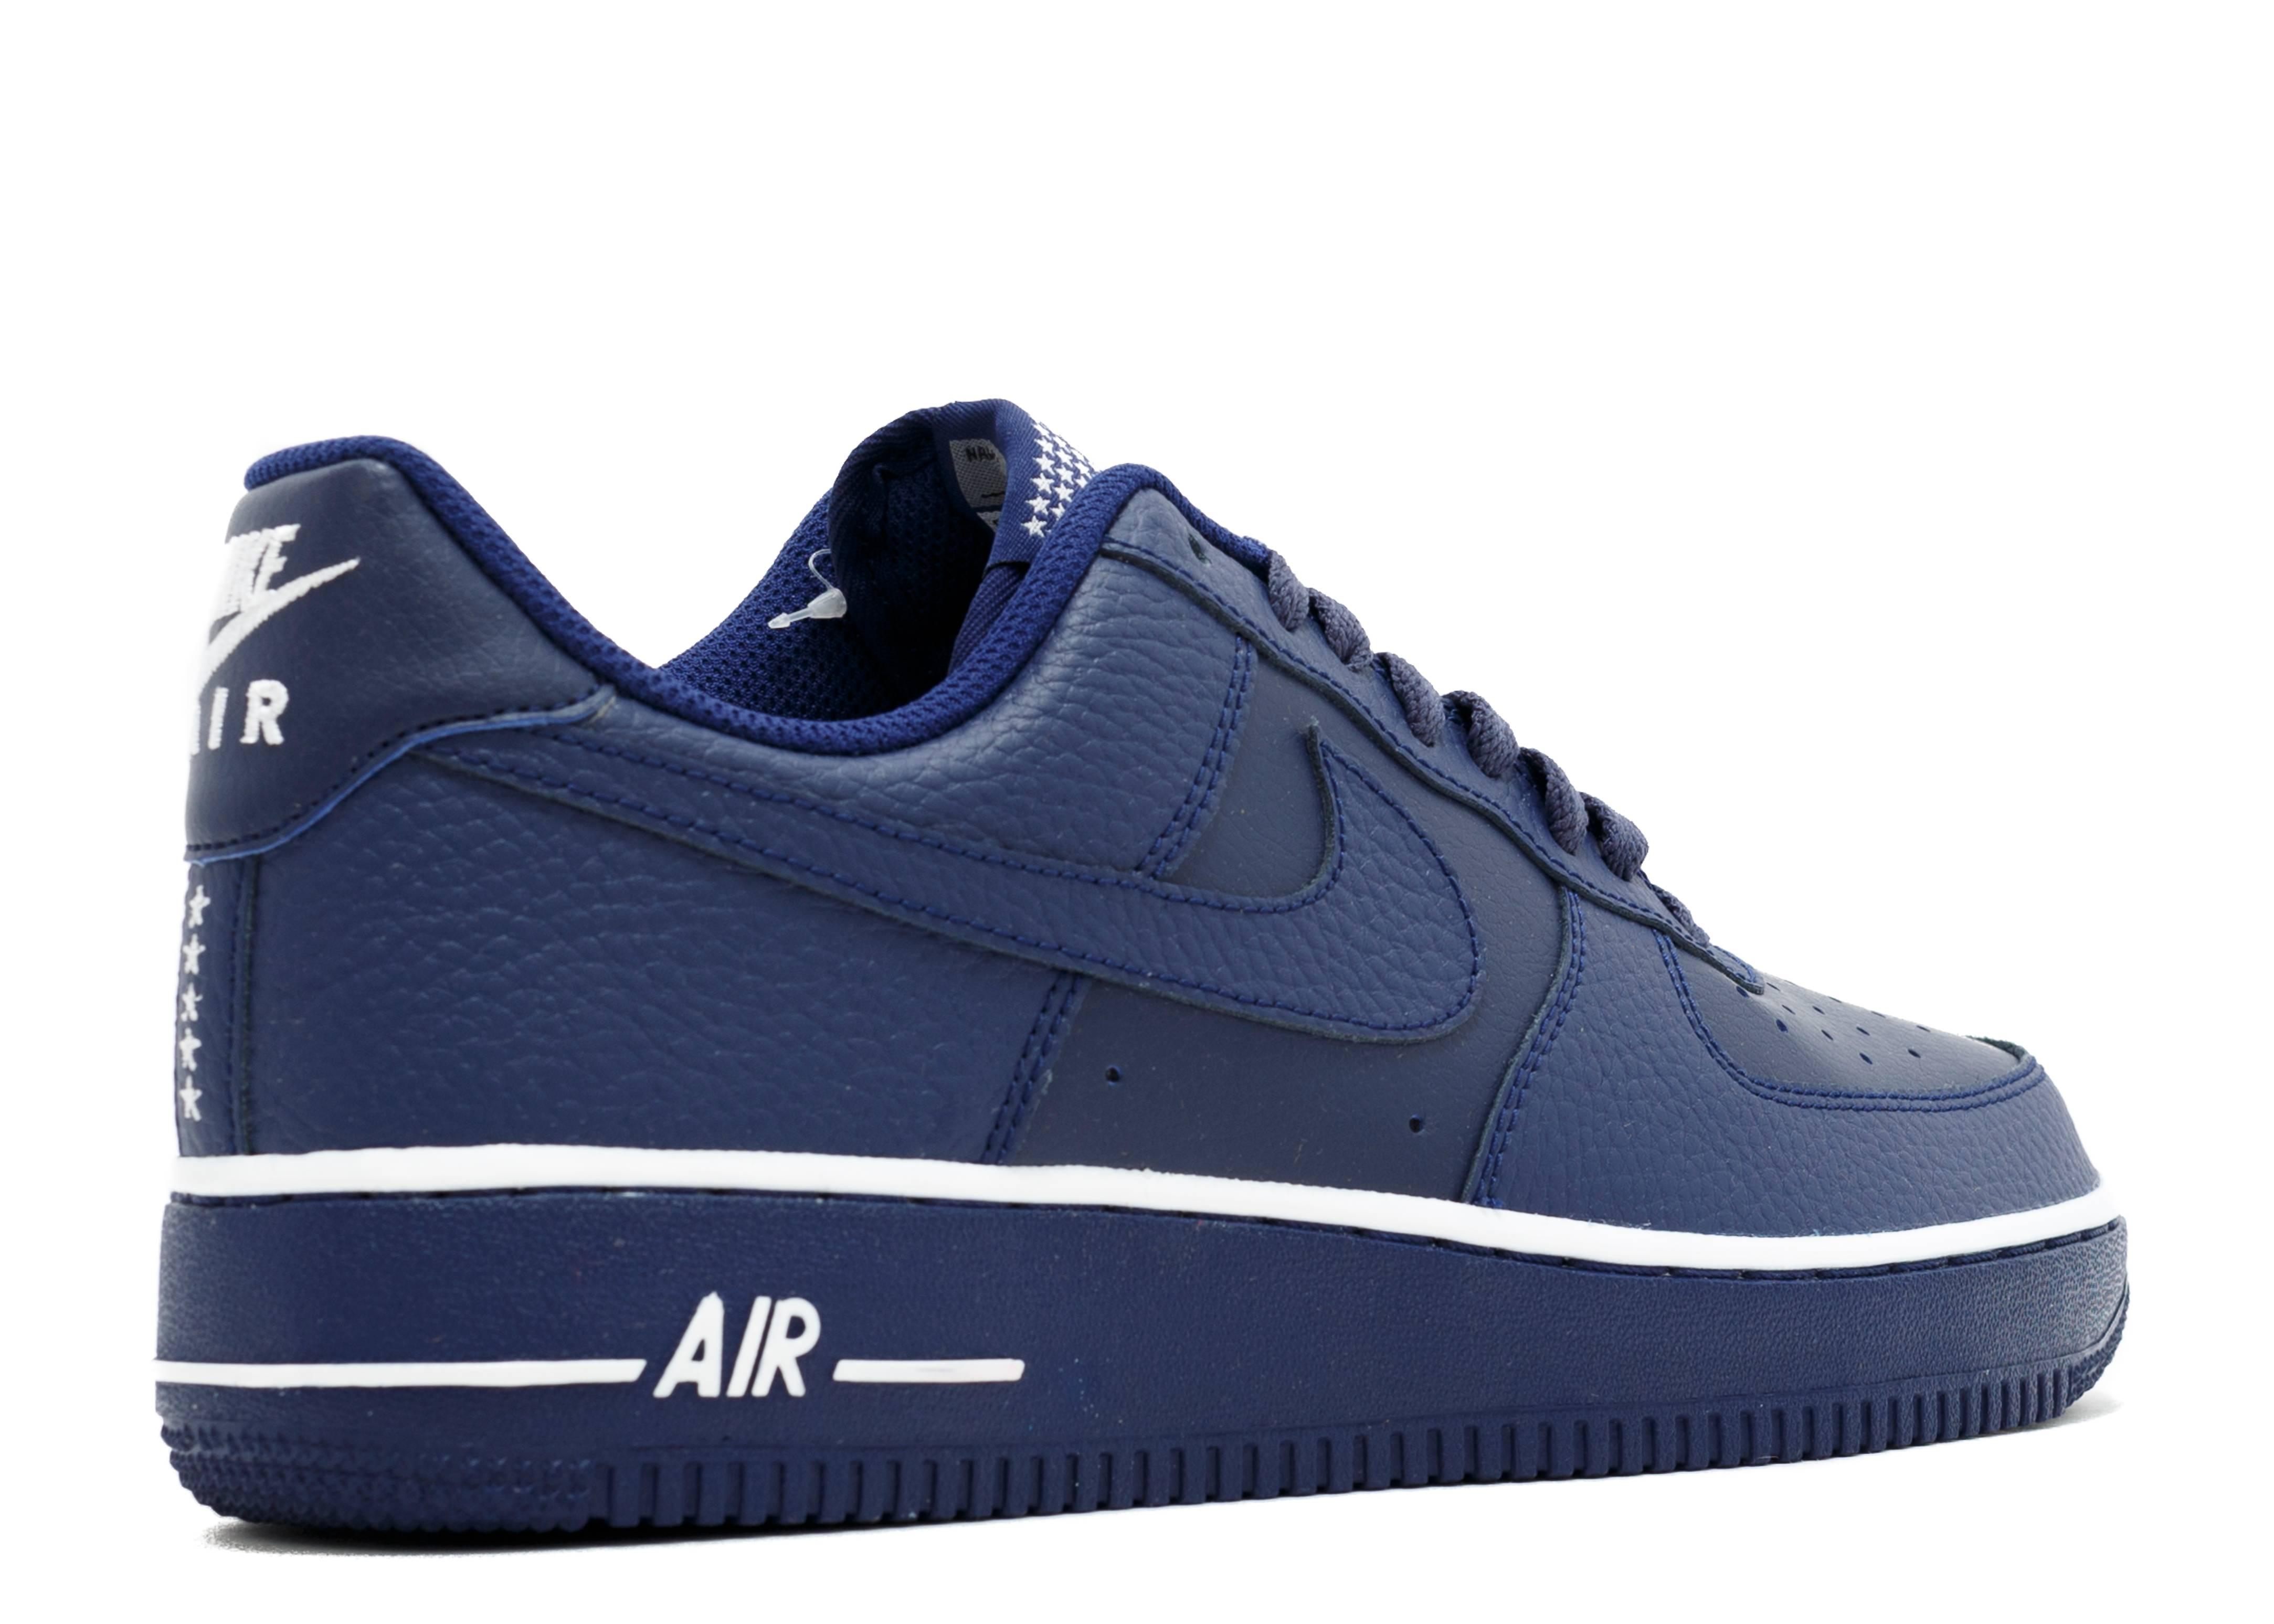 hot sale online 05e04 f833b ... Air Force 1 Low - Nike - 488298 437 - loyal blueloyal blue Flight Club .